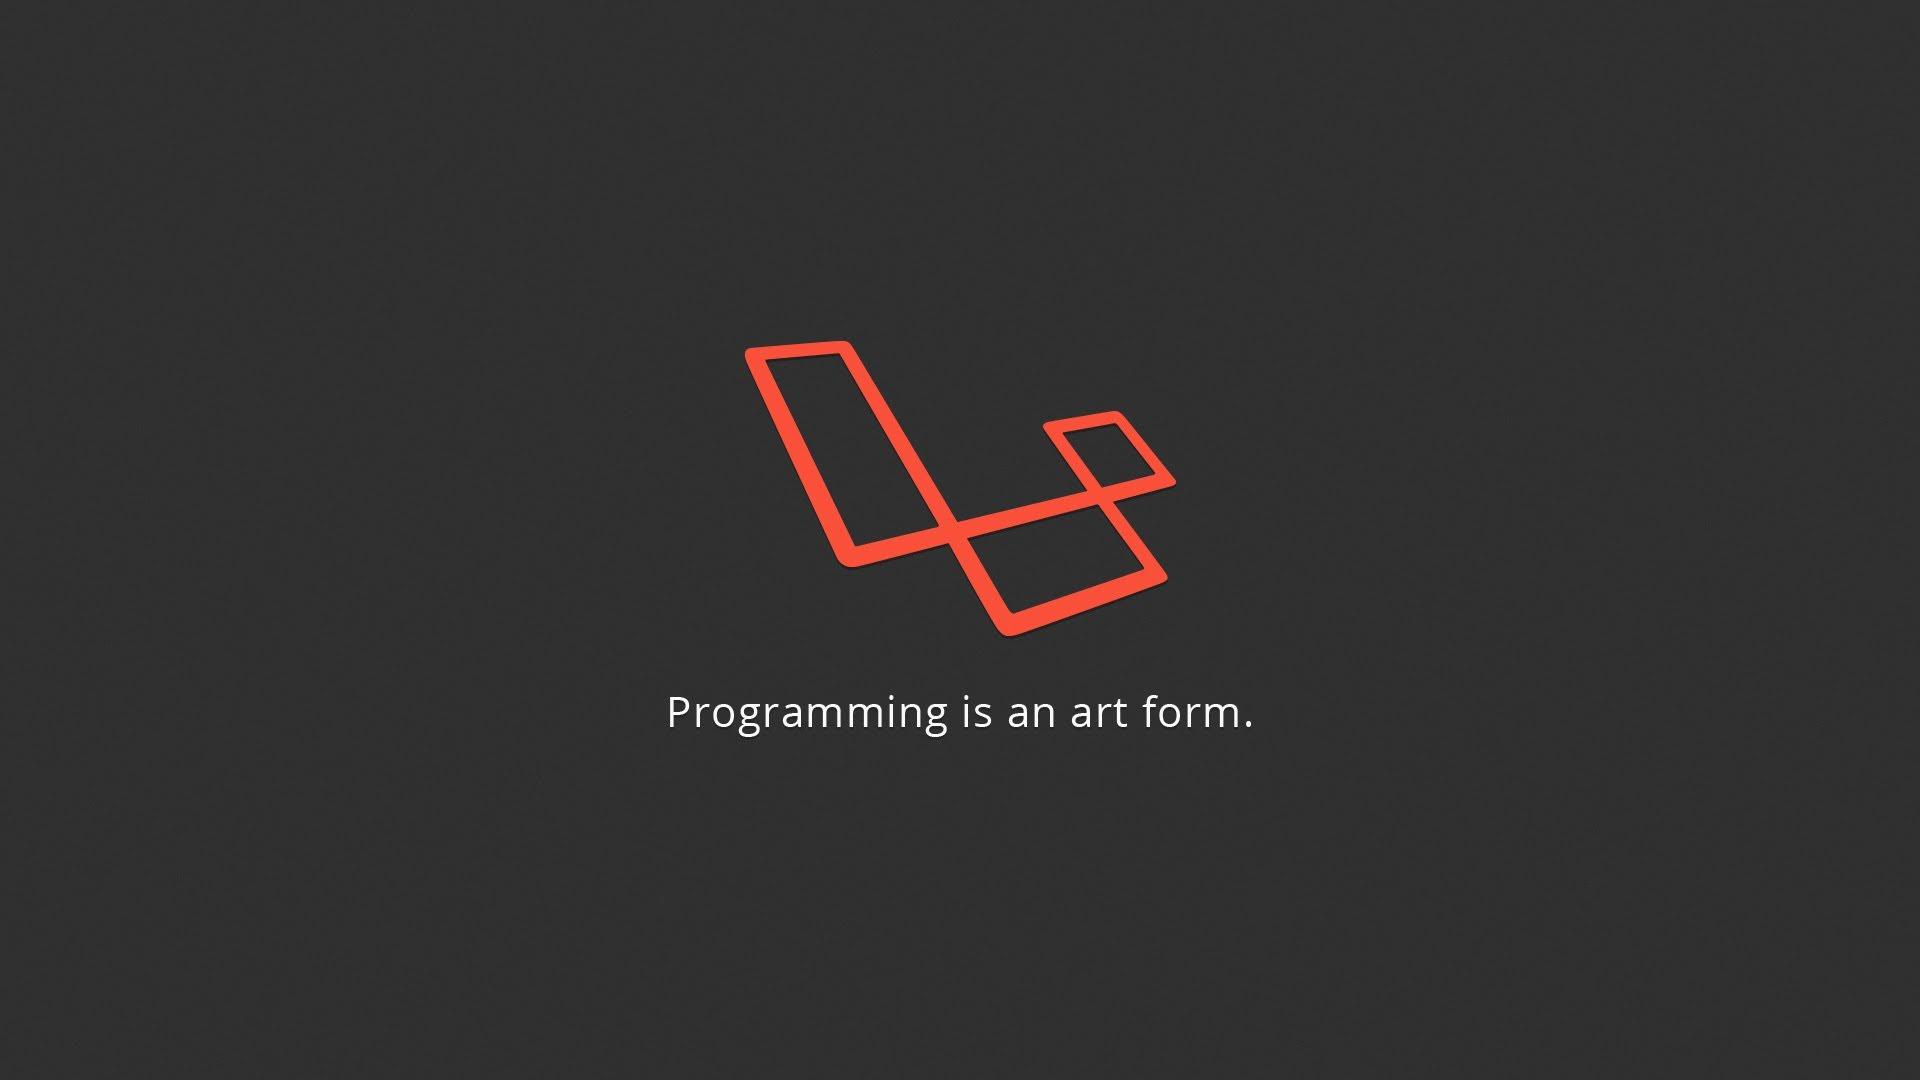 Web Developer Quote Wallpaper Free Stock Photo Of Code Coding Programmer